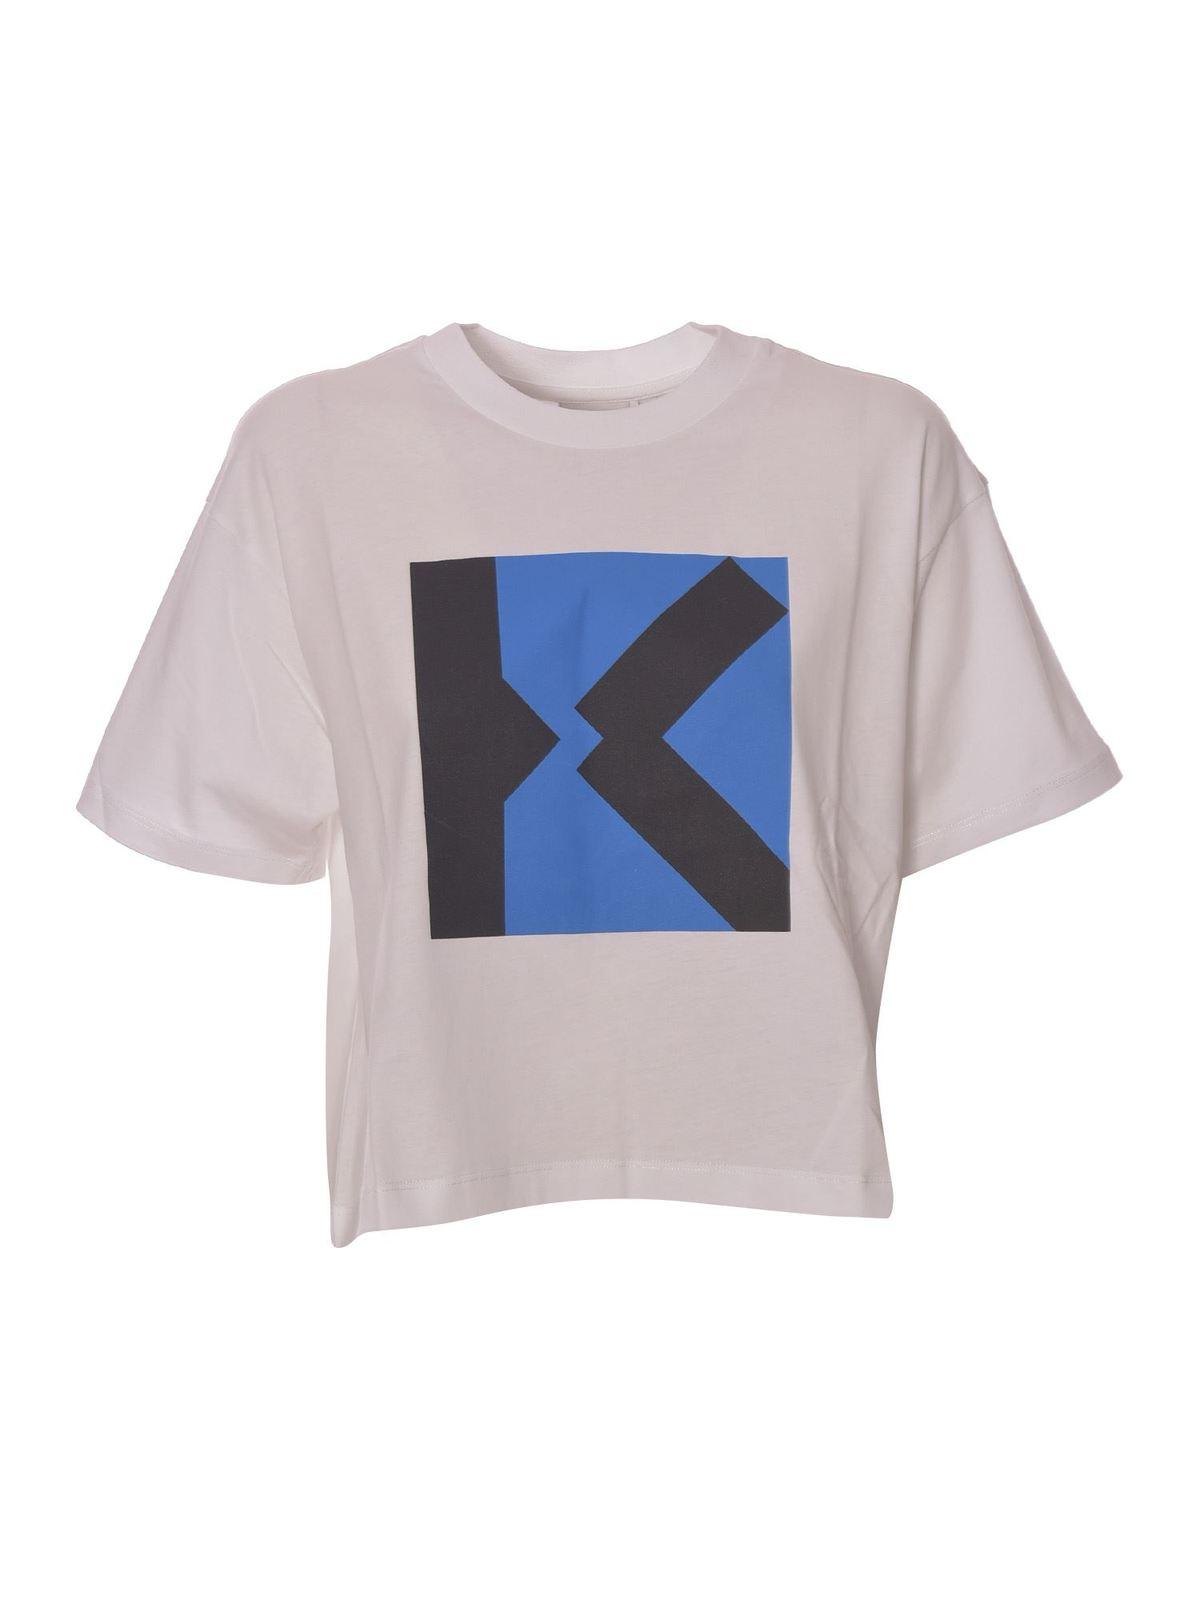 Kenzo BLOCKED K BOXY SPORTS T-SHIRT